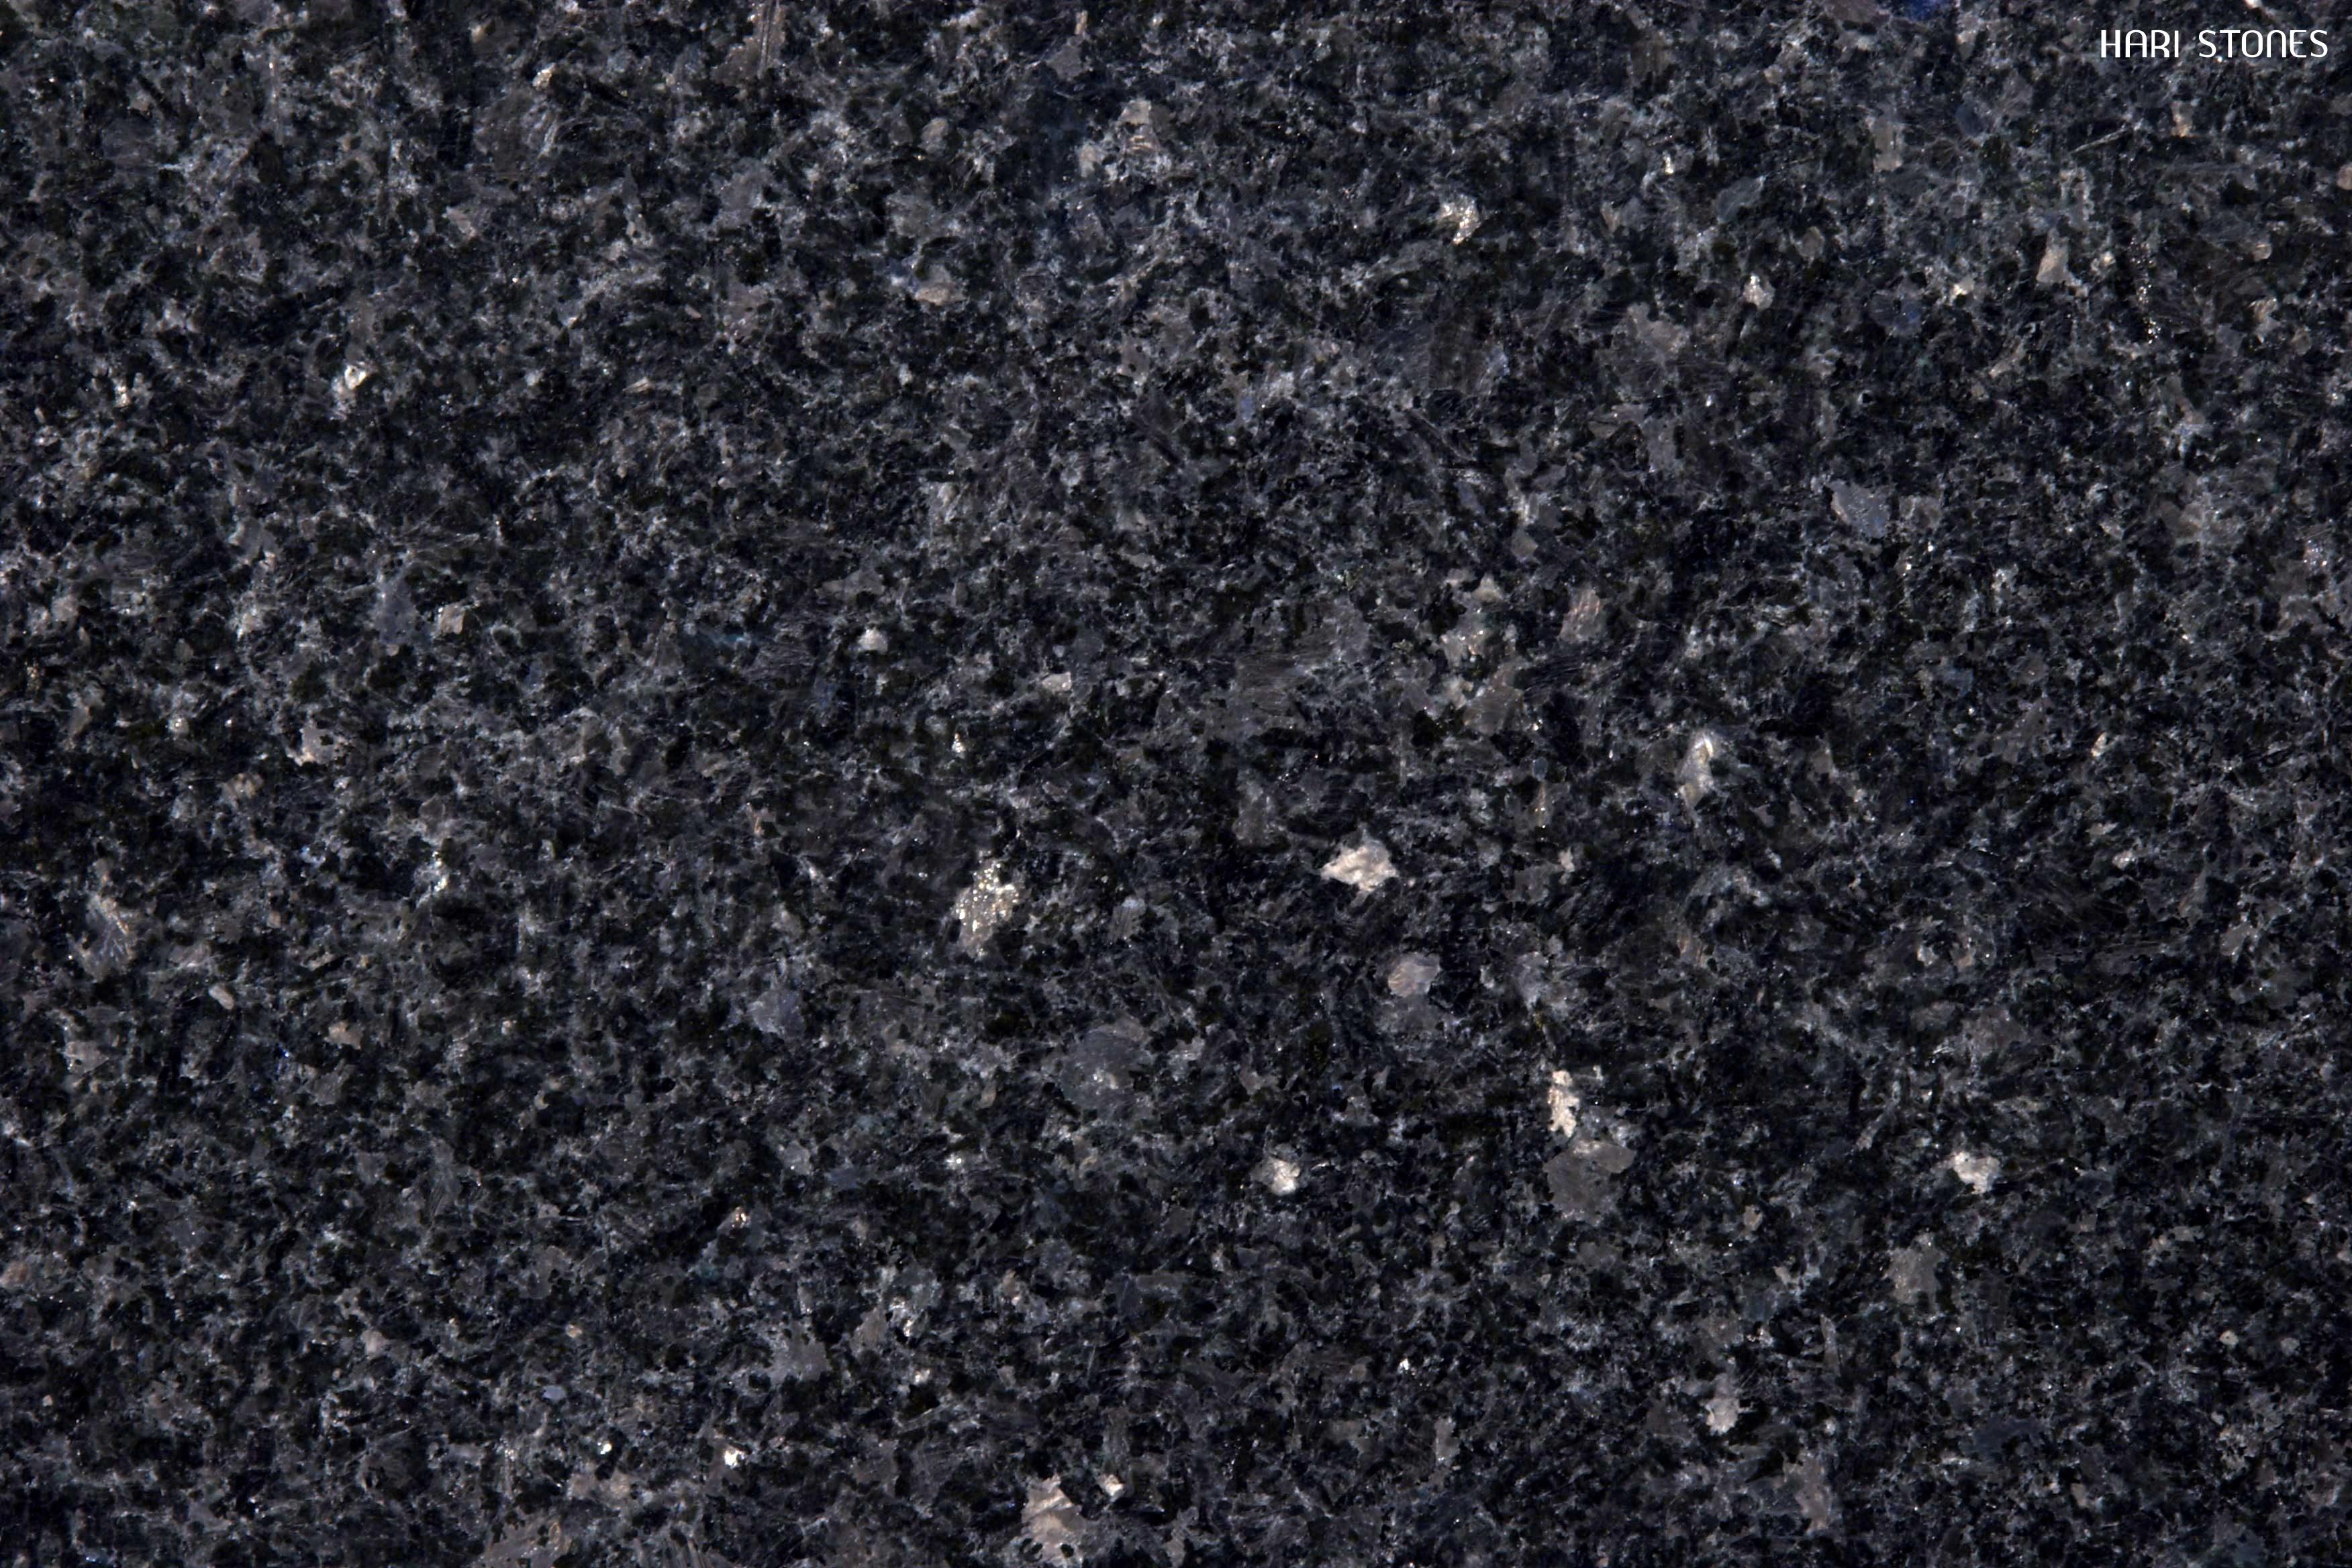 Angola Black Slabs Suppliers and Distributors